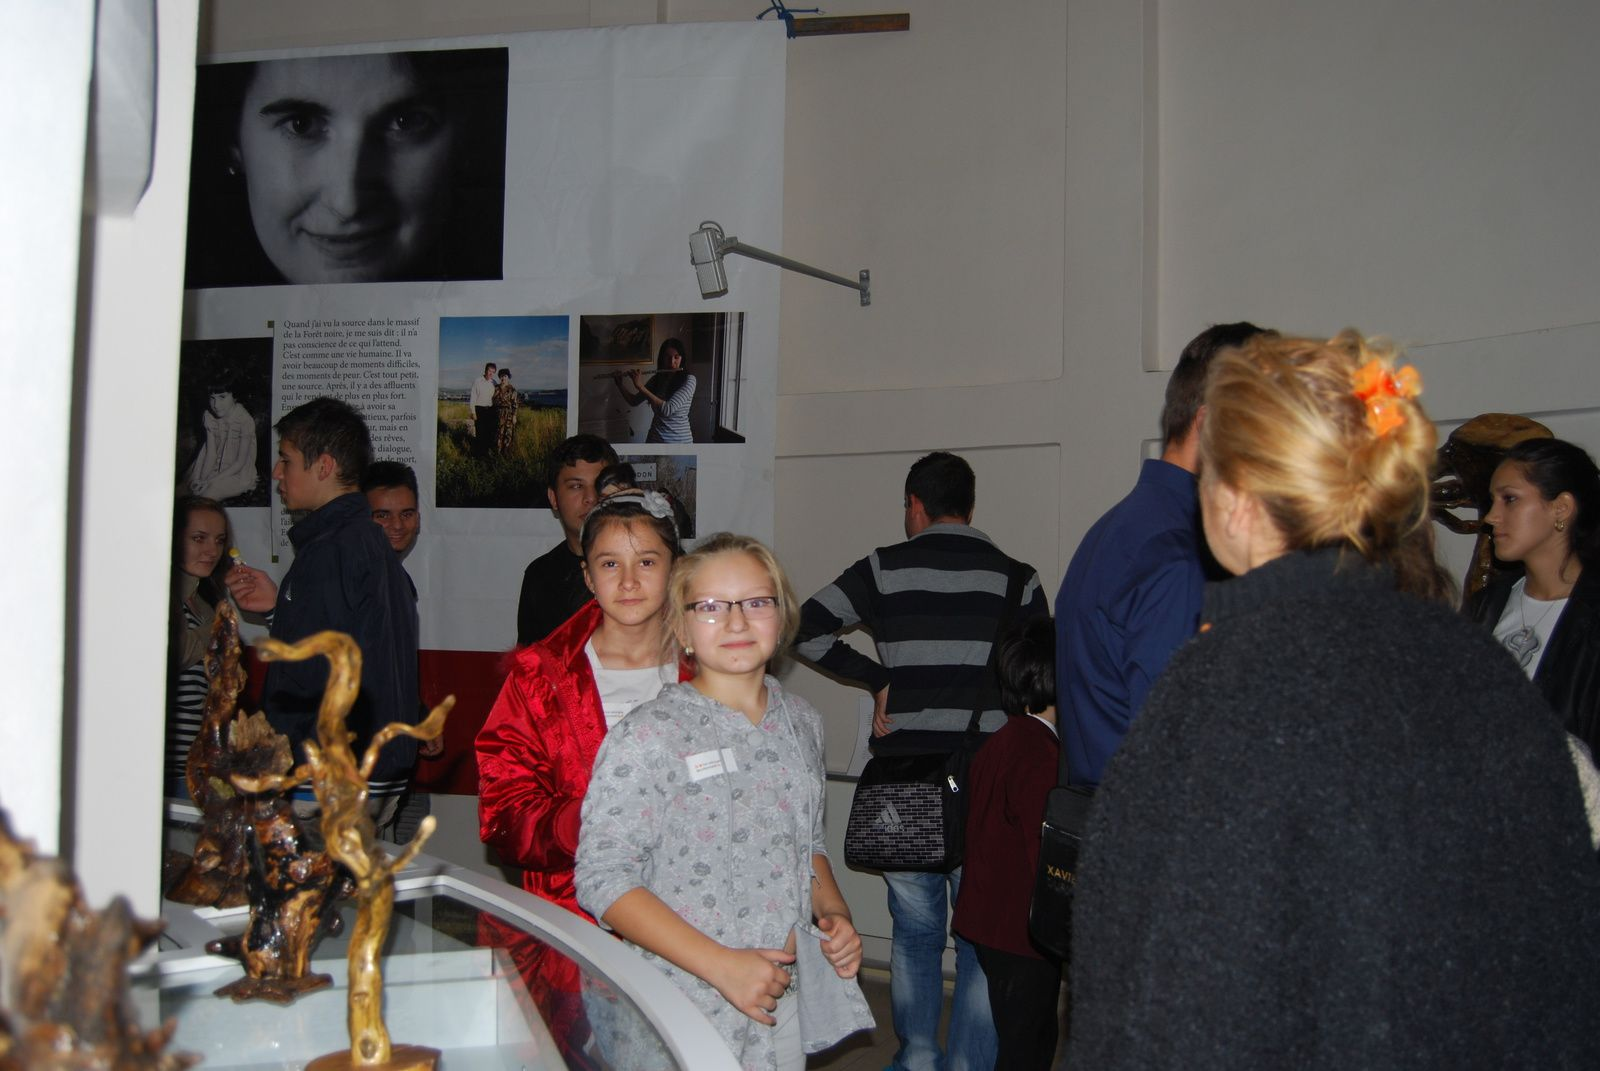 Ziua Educatiei Nonformale octombrie 2013 -Vizita Expozitiei Eyouthocracy